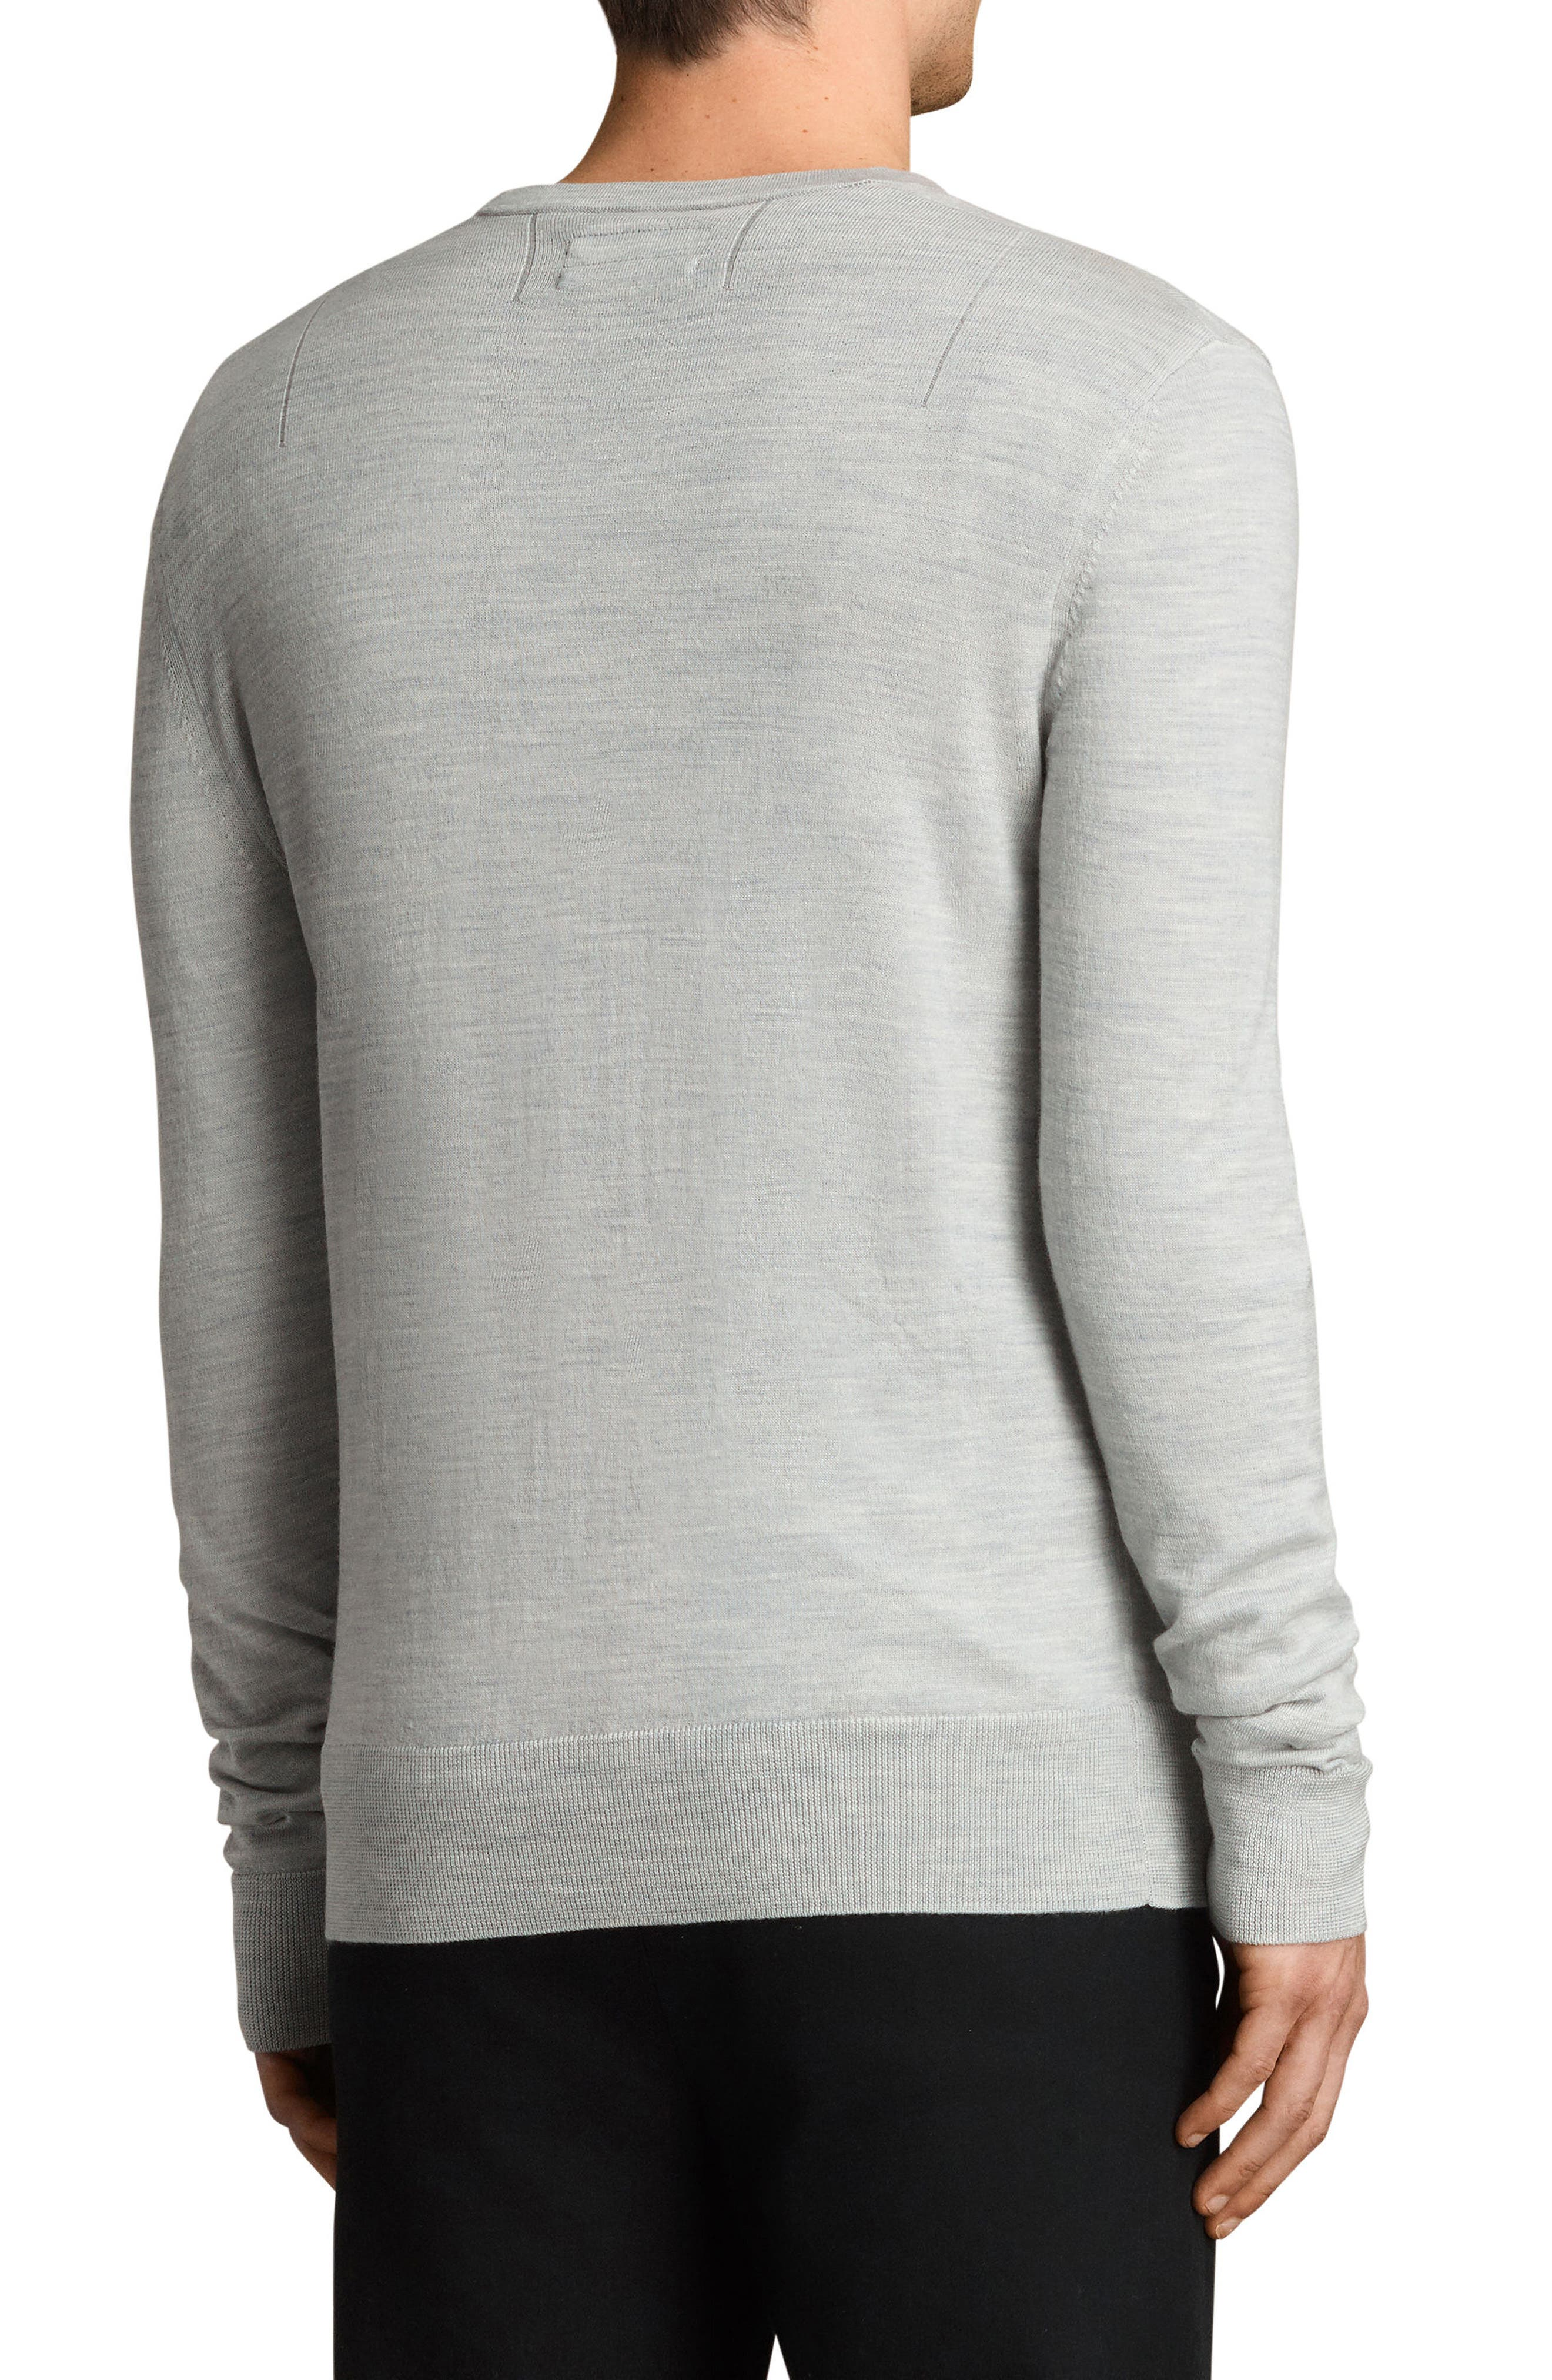 Mode Slim Fit Merino Wool Sweater,                             Alternate thumbnail 11, color,